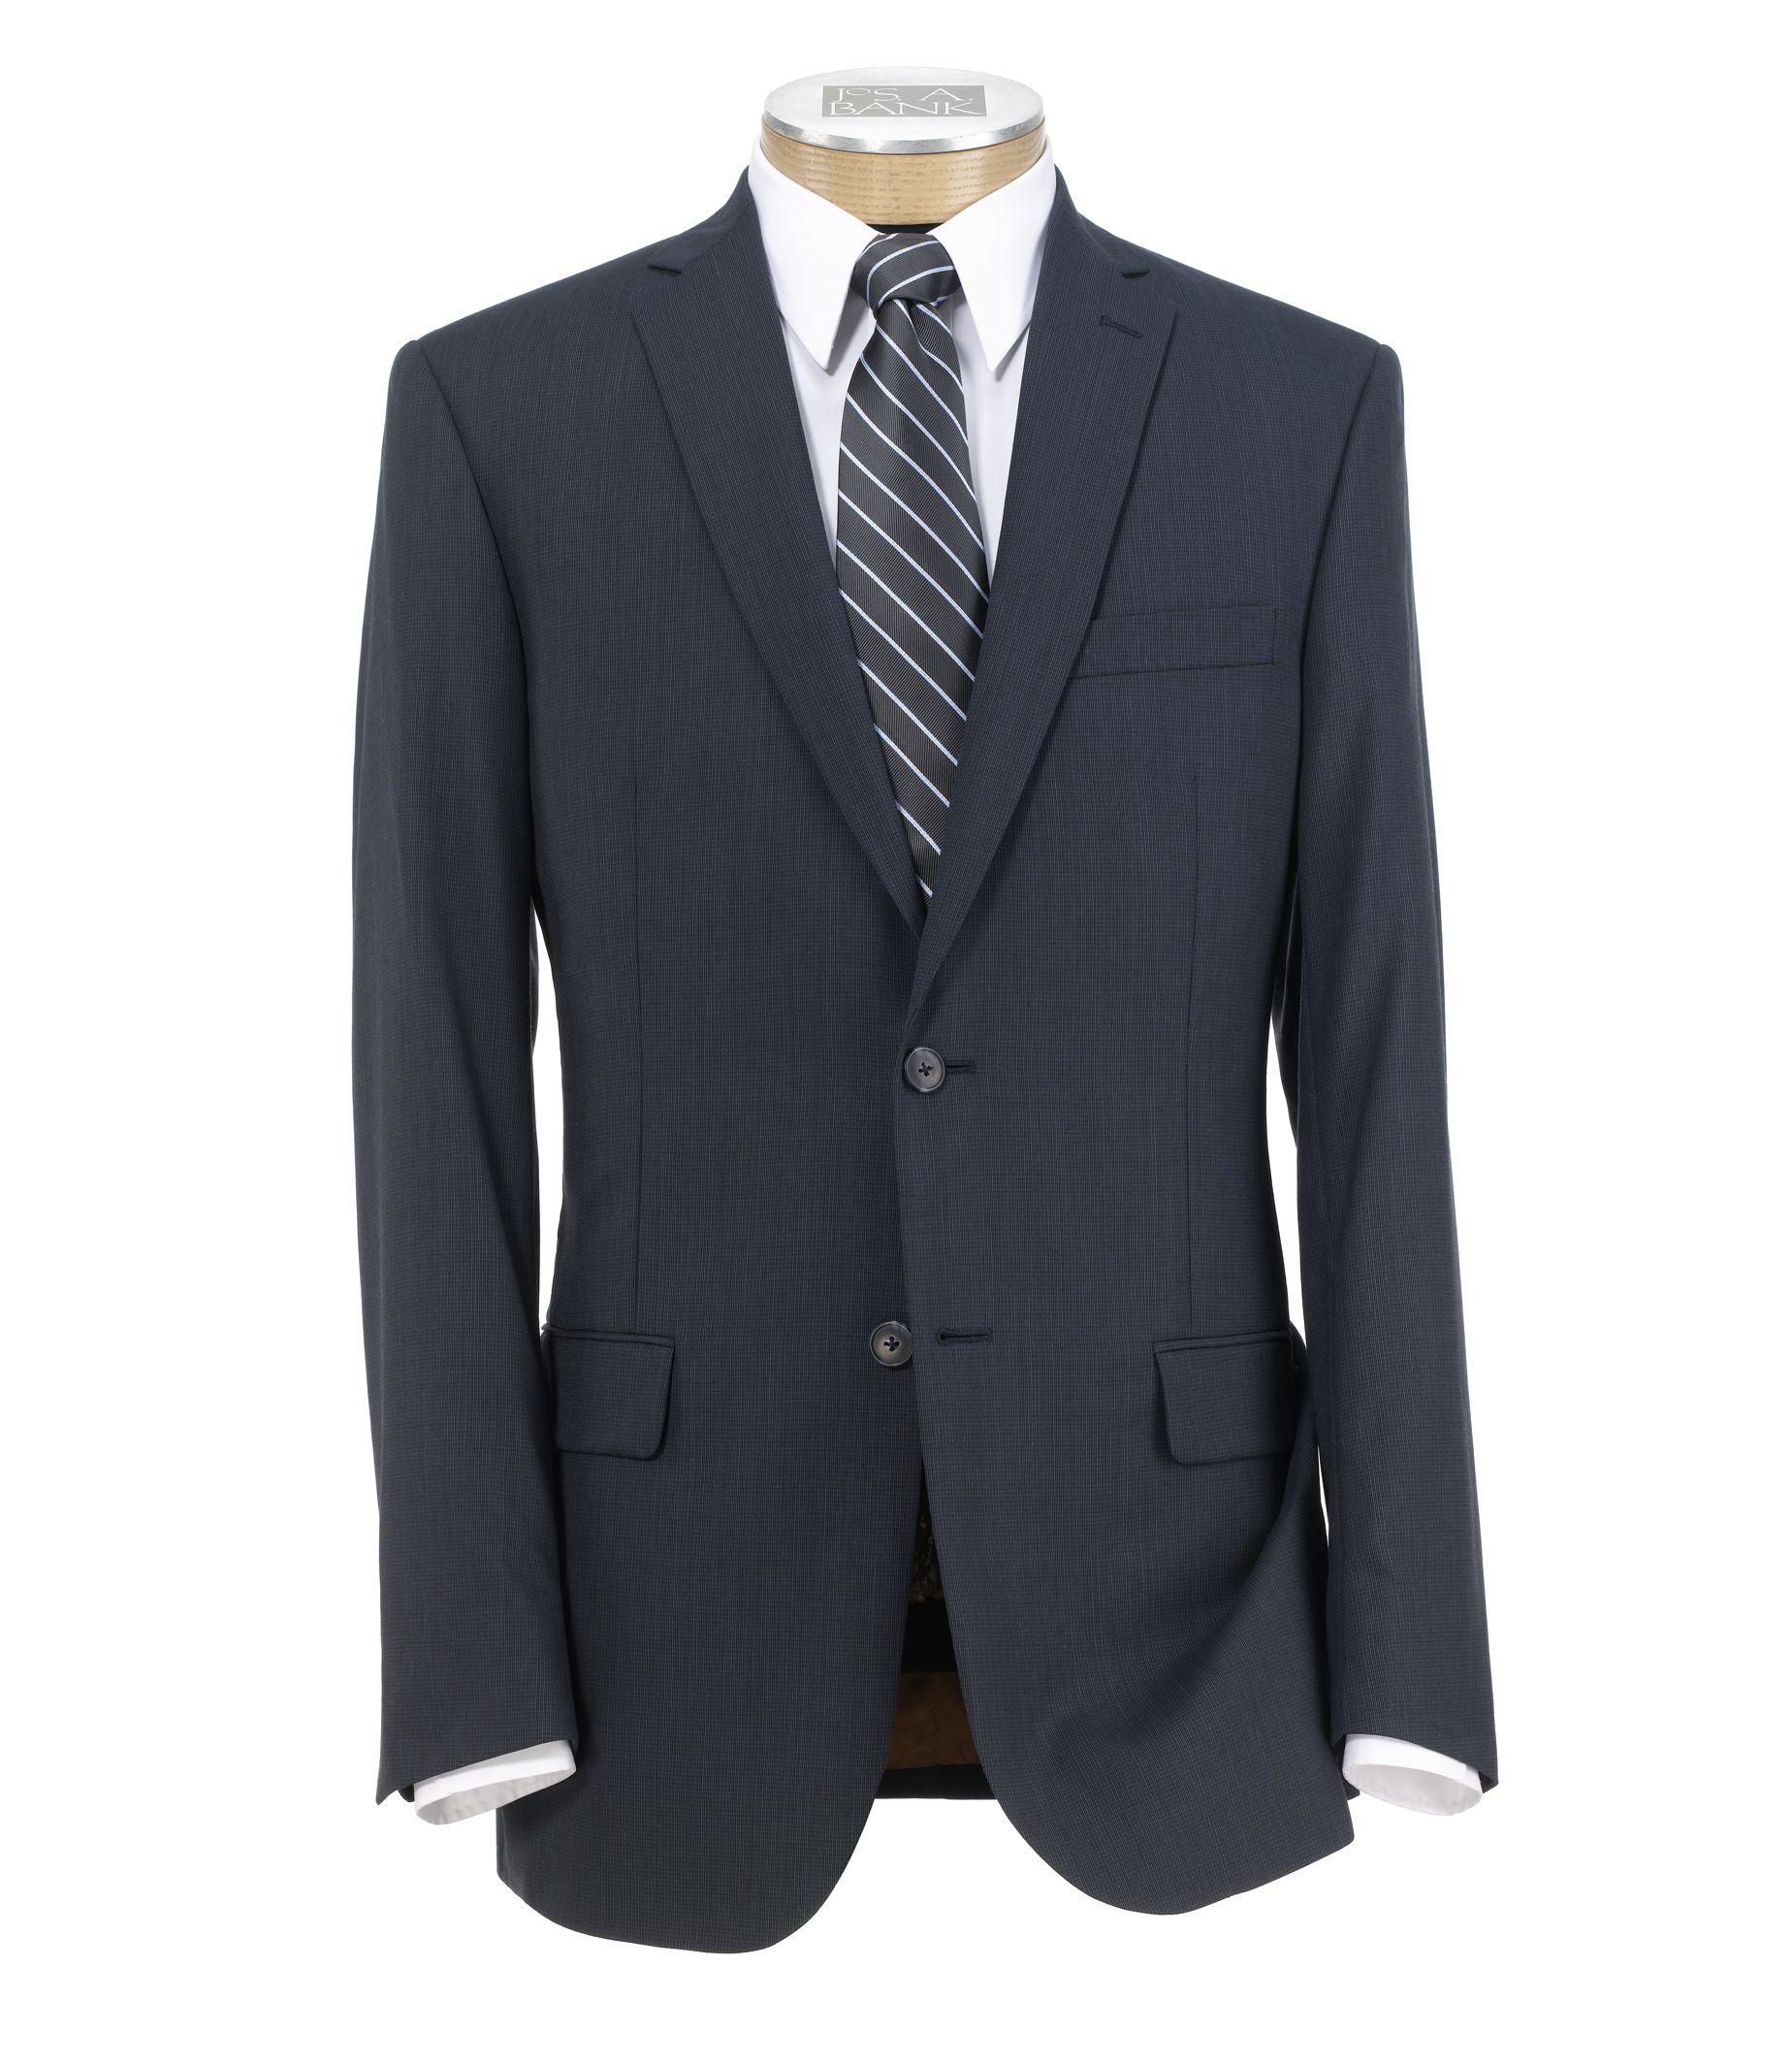 Joseph Slim Fit 2 Button Plain Front Wool Suit- Navy Mini Grid Checkered